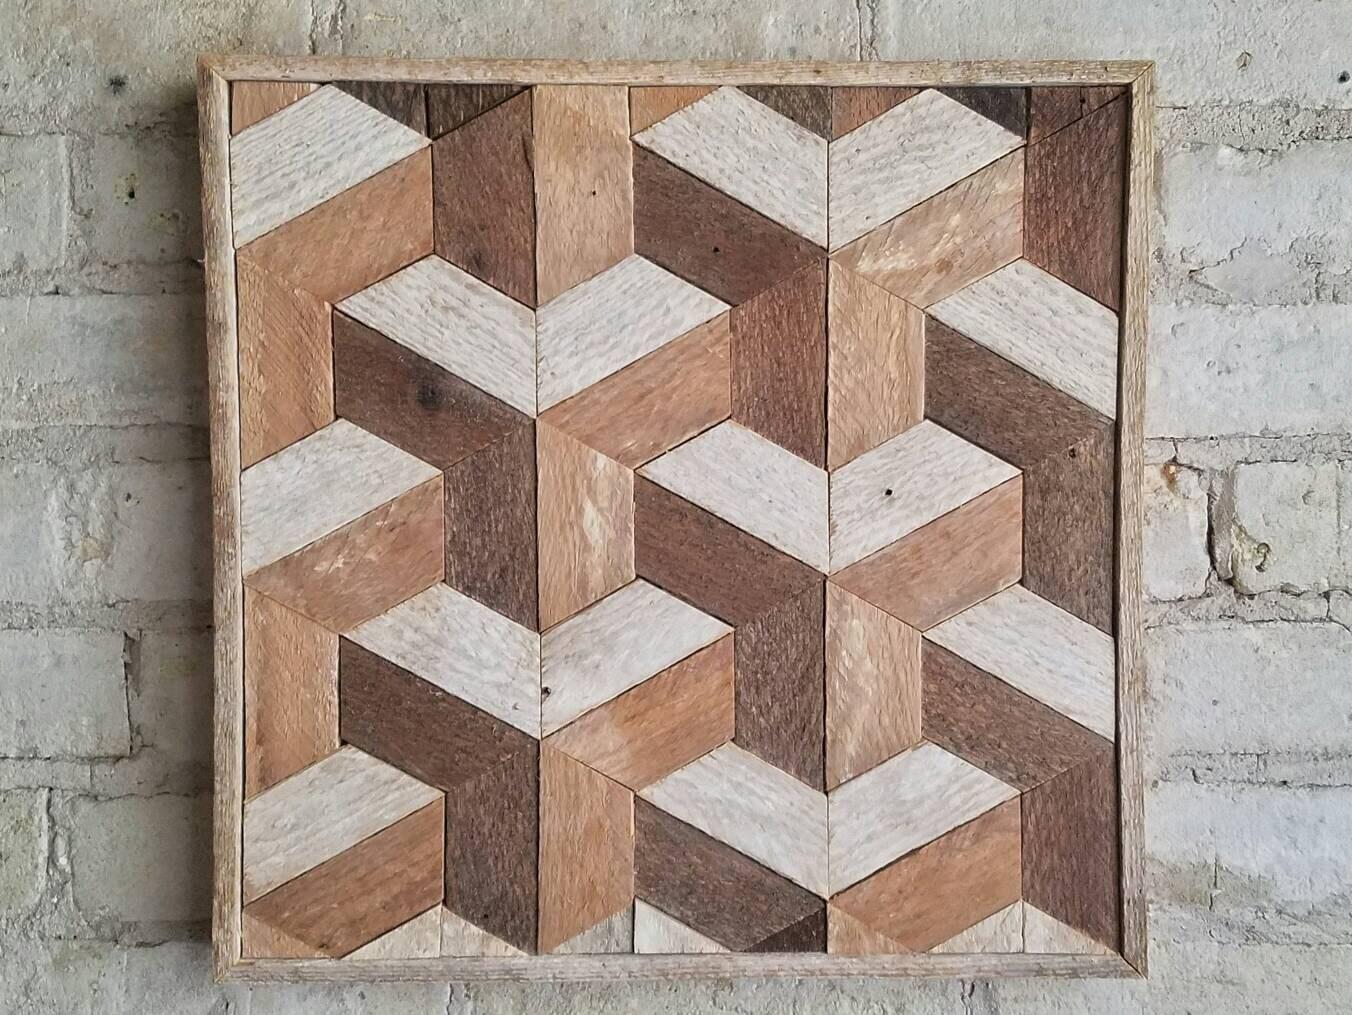 Reclaimed wood wall art decor lath geometric pattern reclaimed wood wall art decor lath geometric pattern tessellation small dailygadgetfo Images